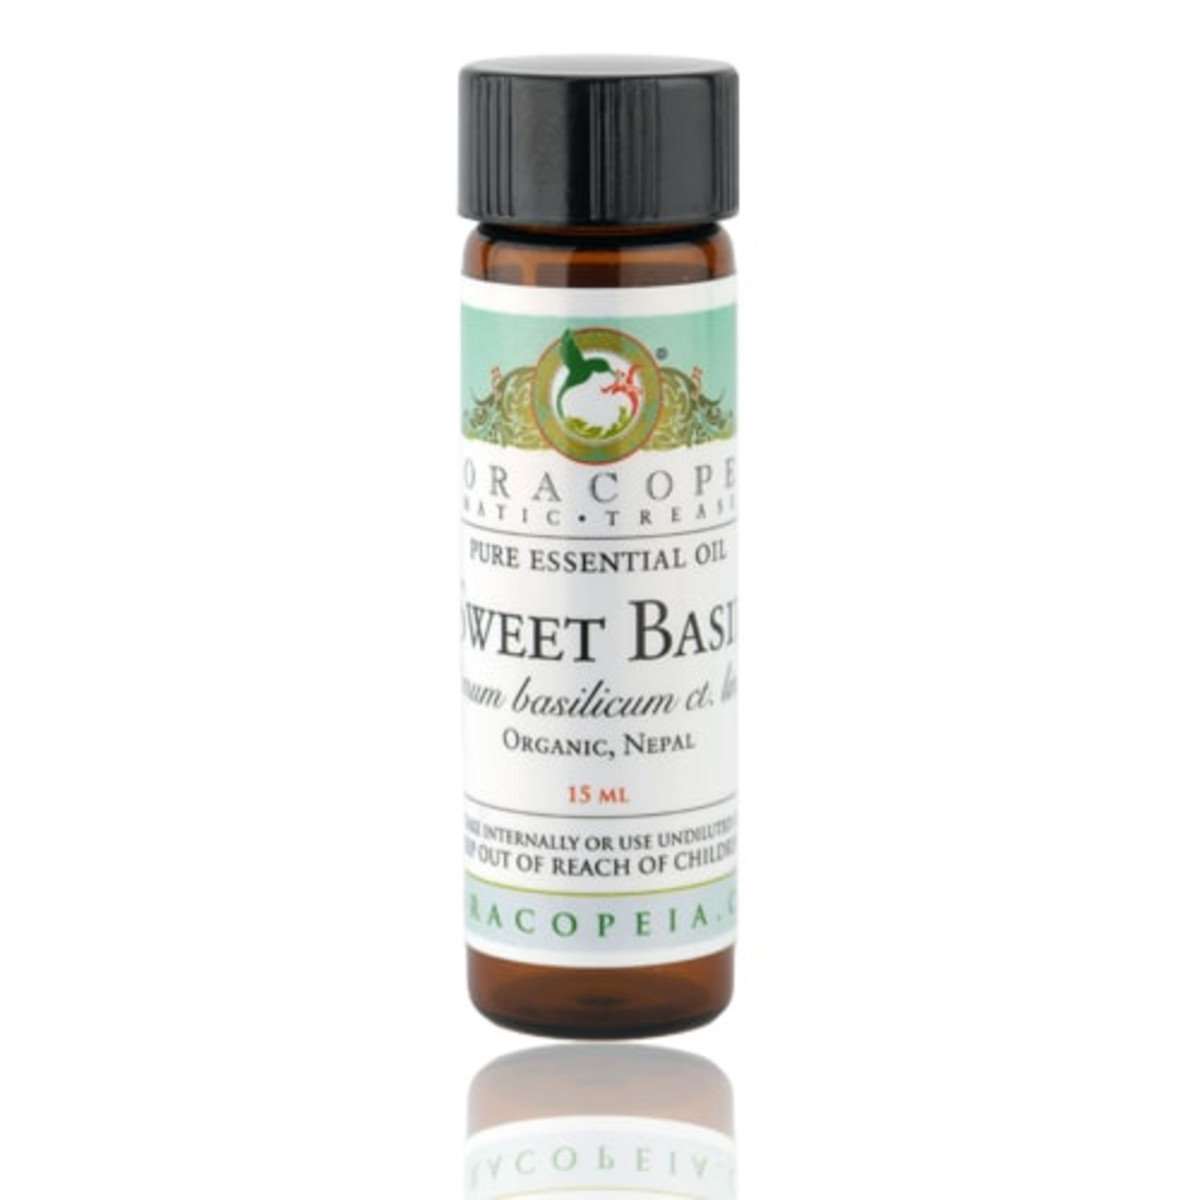 Sweet Basil Essential Oil-1